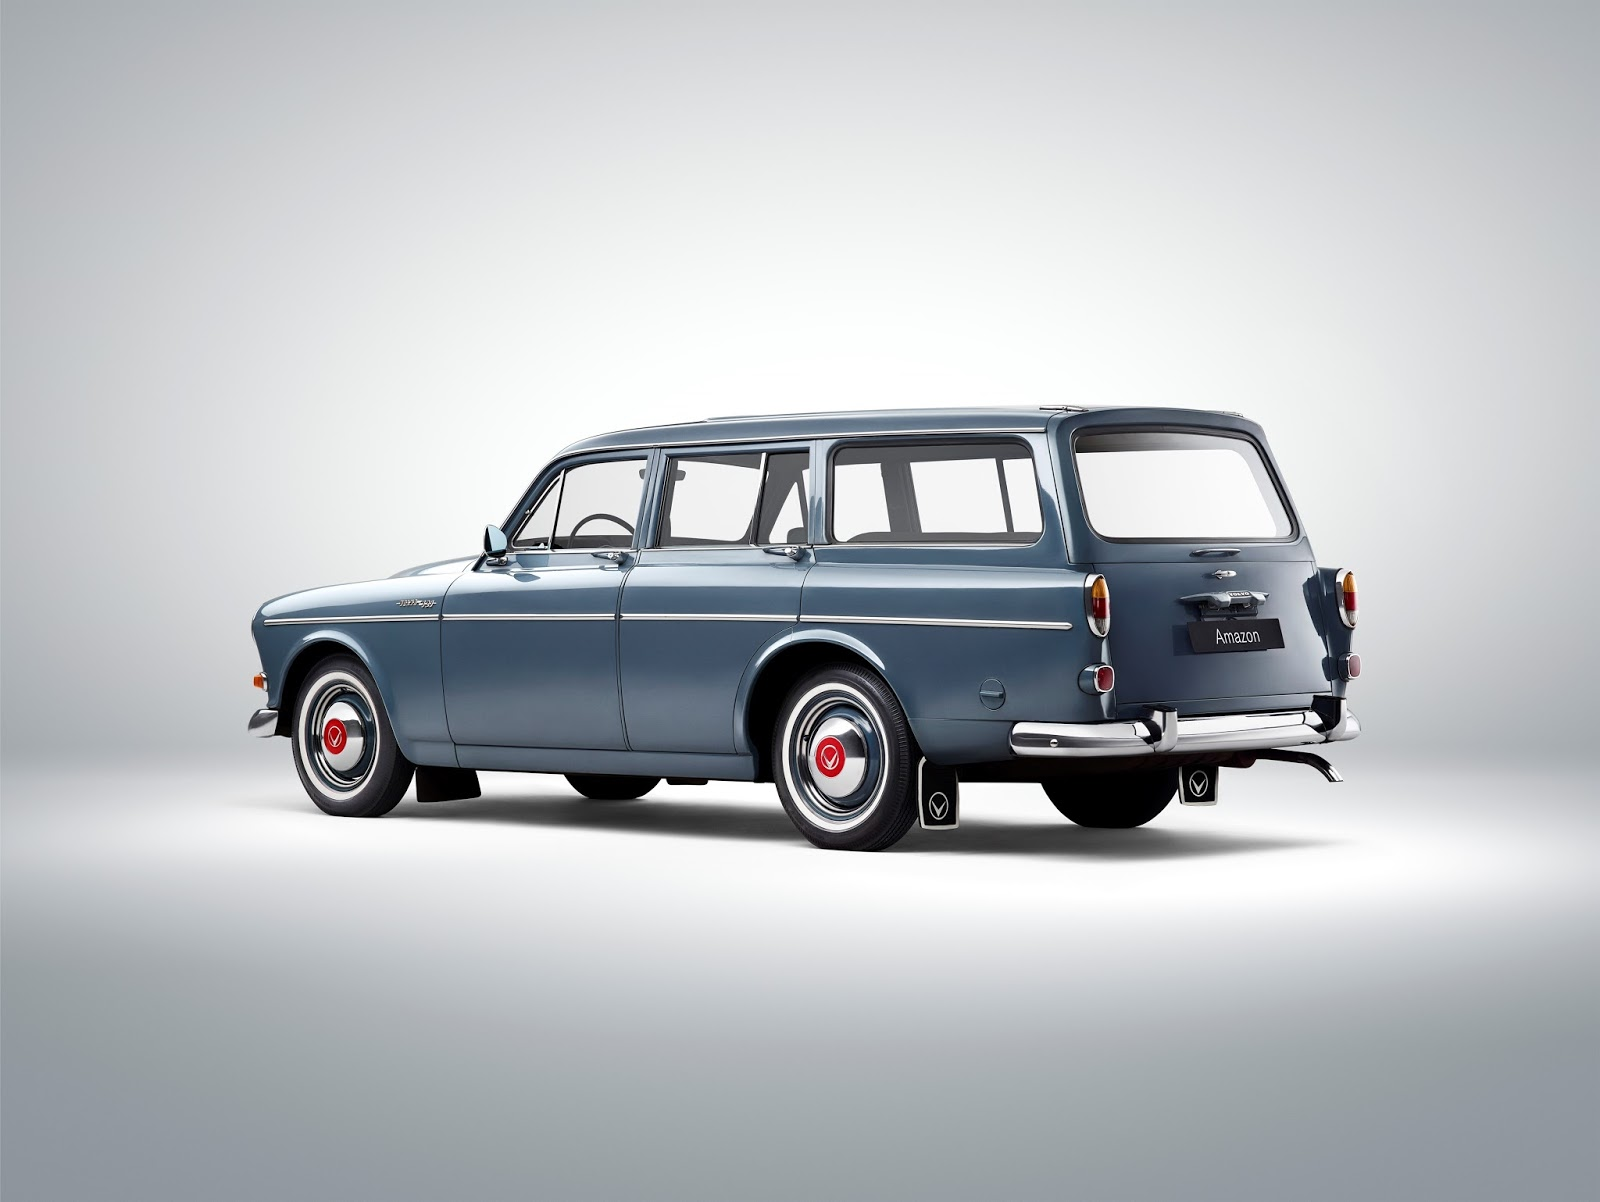 173624 Volvo 221 Amazon Το V90 είναι το πιο όμορφο, το πιο ασφαλές station wagon και το πιο... Volvo Station Wagon, Volvo, Volvo V90